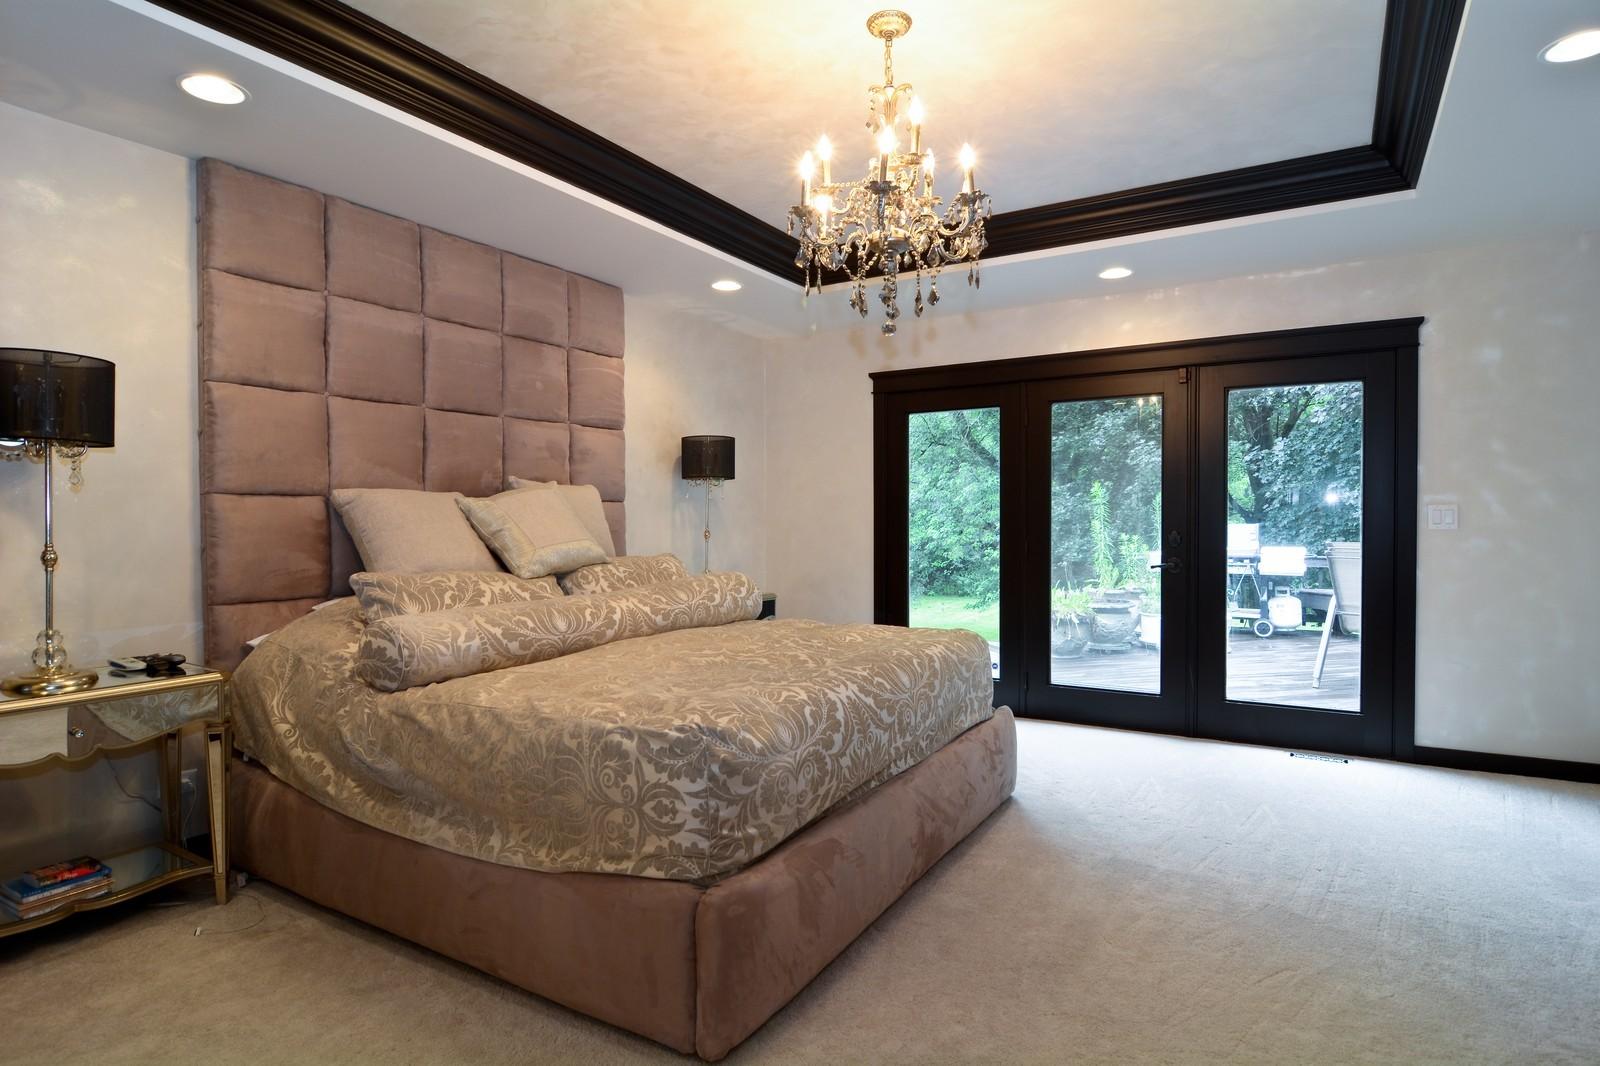 Real Estate Photography - 2S611 Arboritumn, Glen Ellyn, IL, 60137 - Master Bedroom